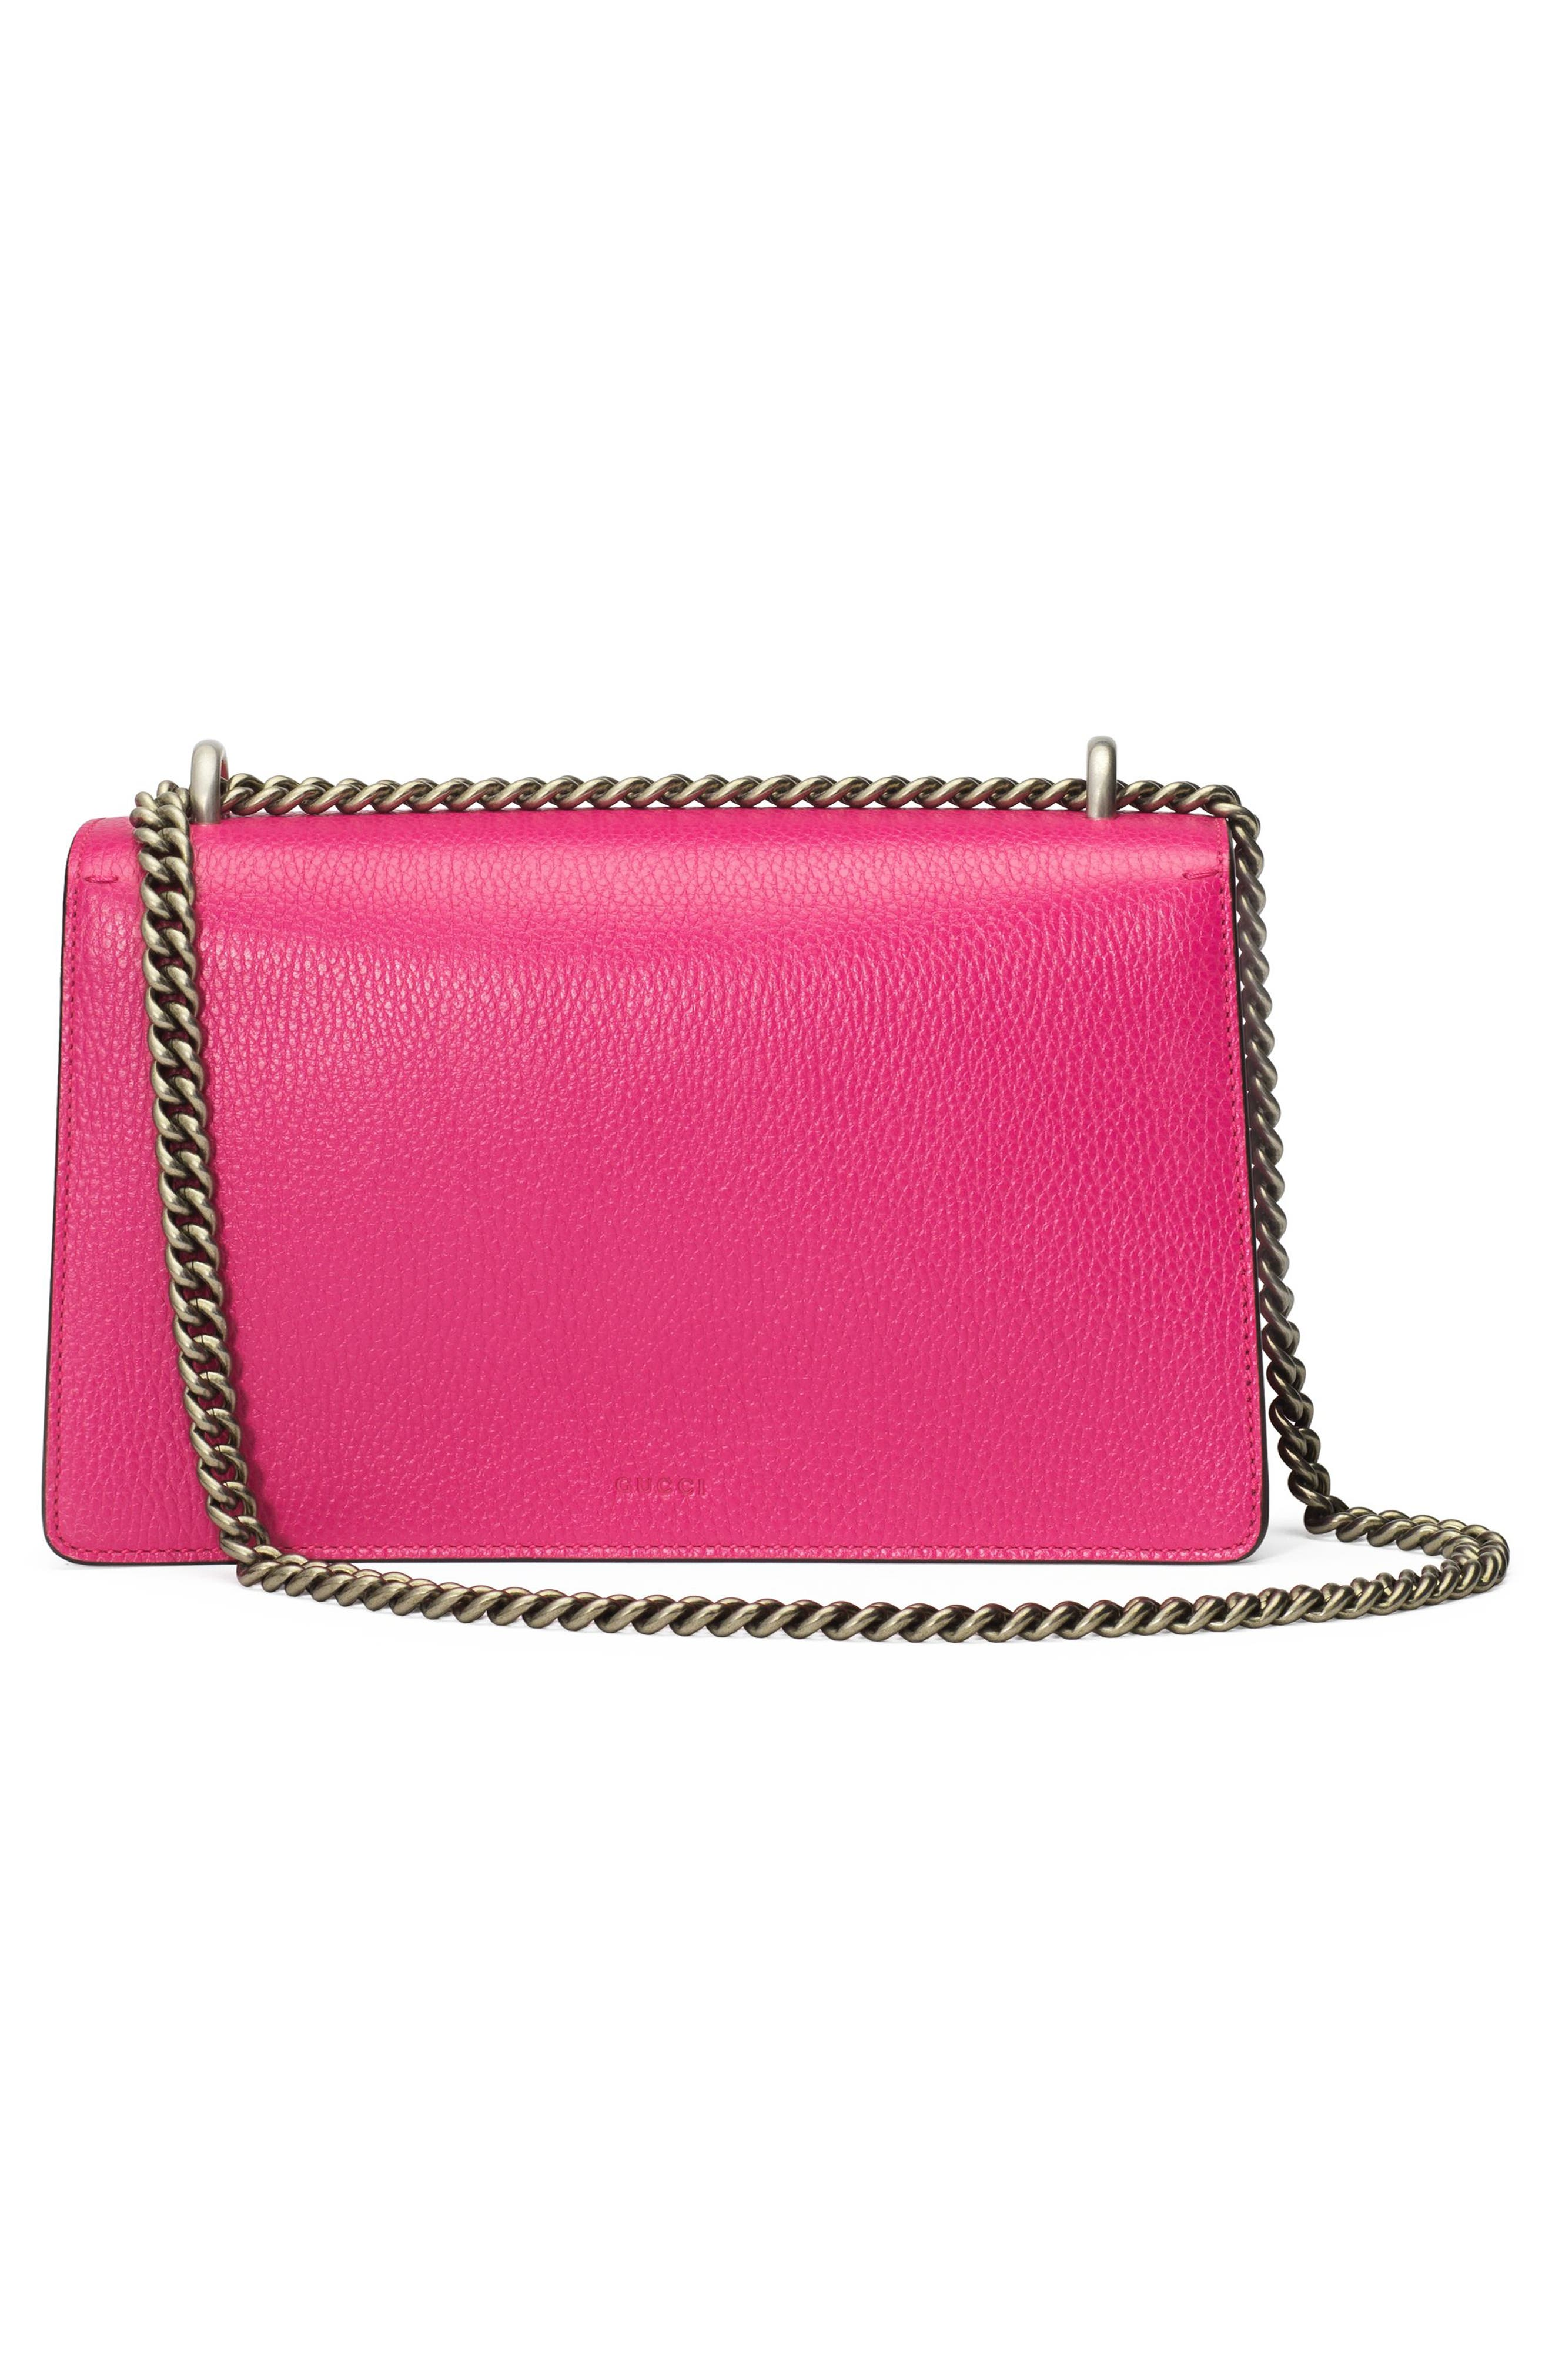 Small Dionysus Guccify Shoulder Bag,                             Alternate thumbnail 2, color,                             Box Pink/ Black Diamond/ Multi